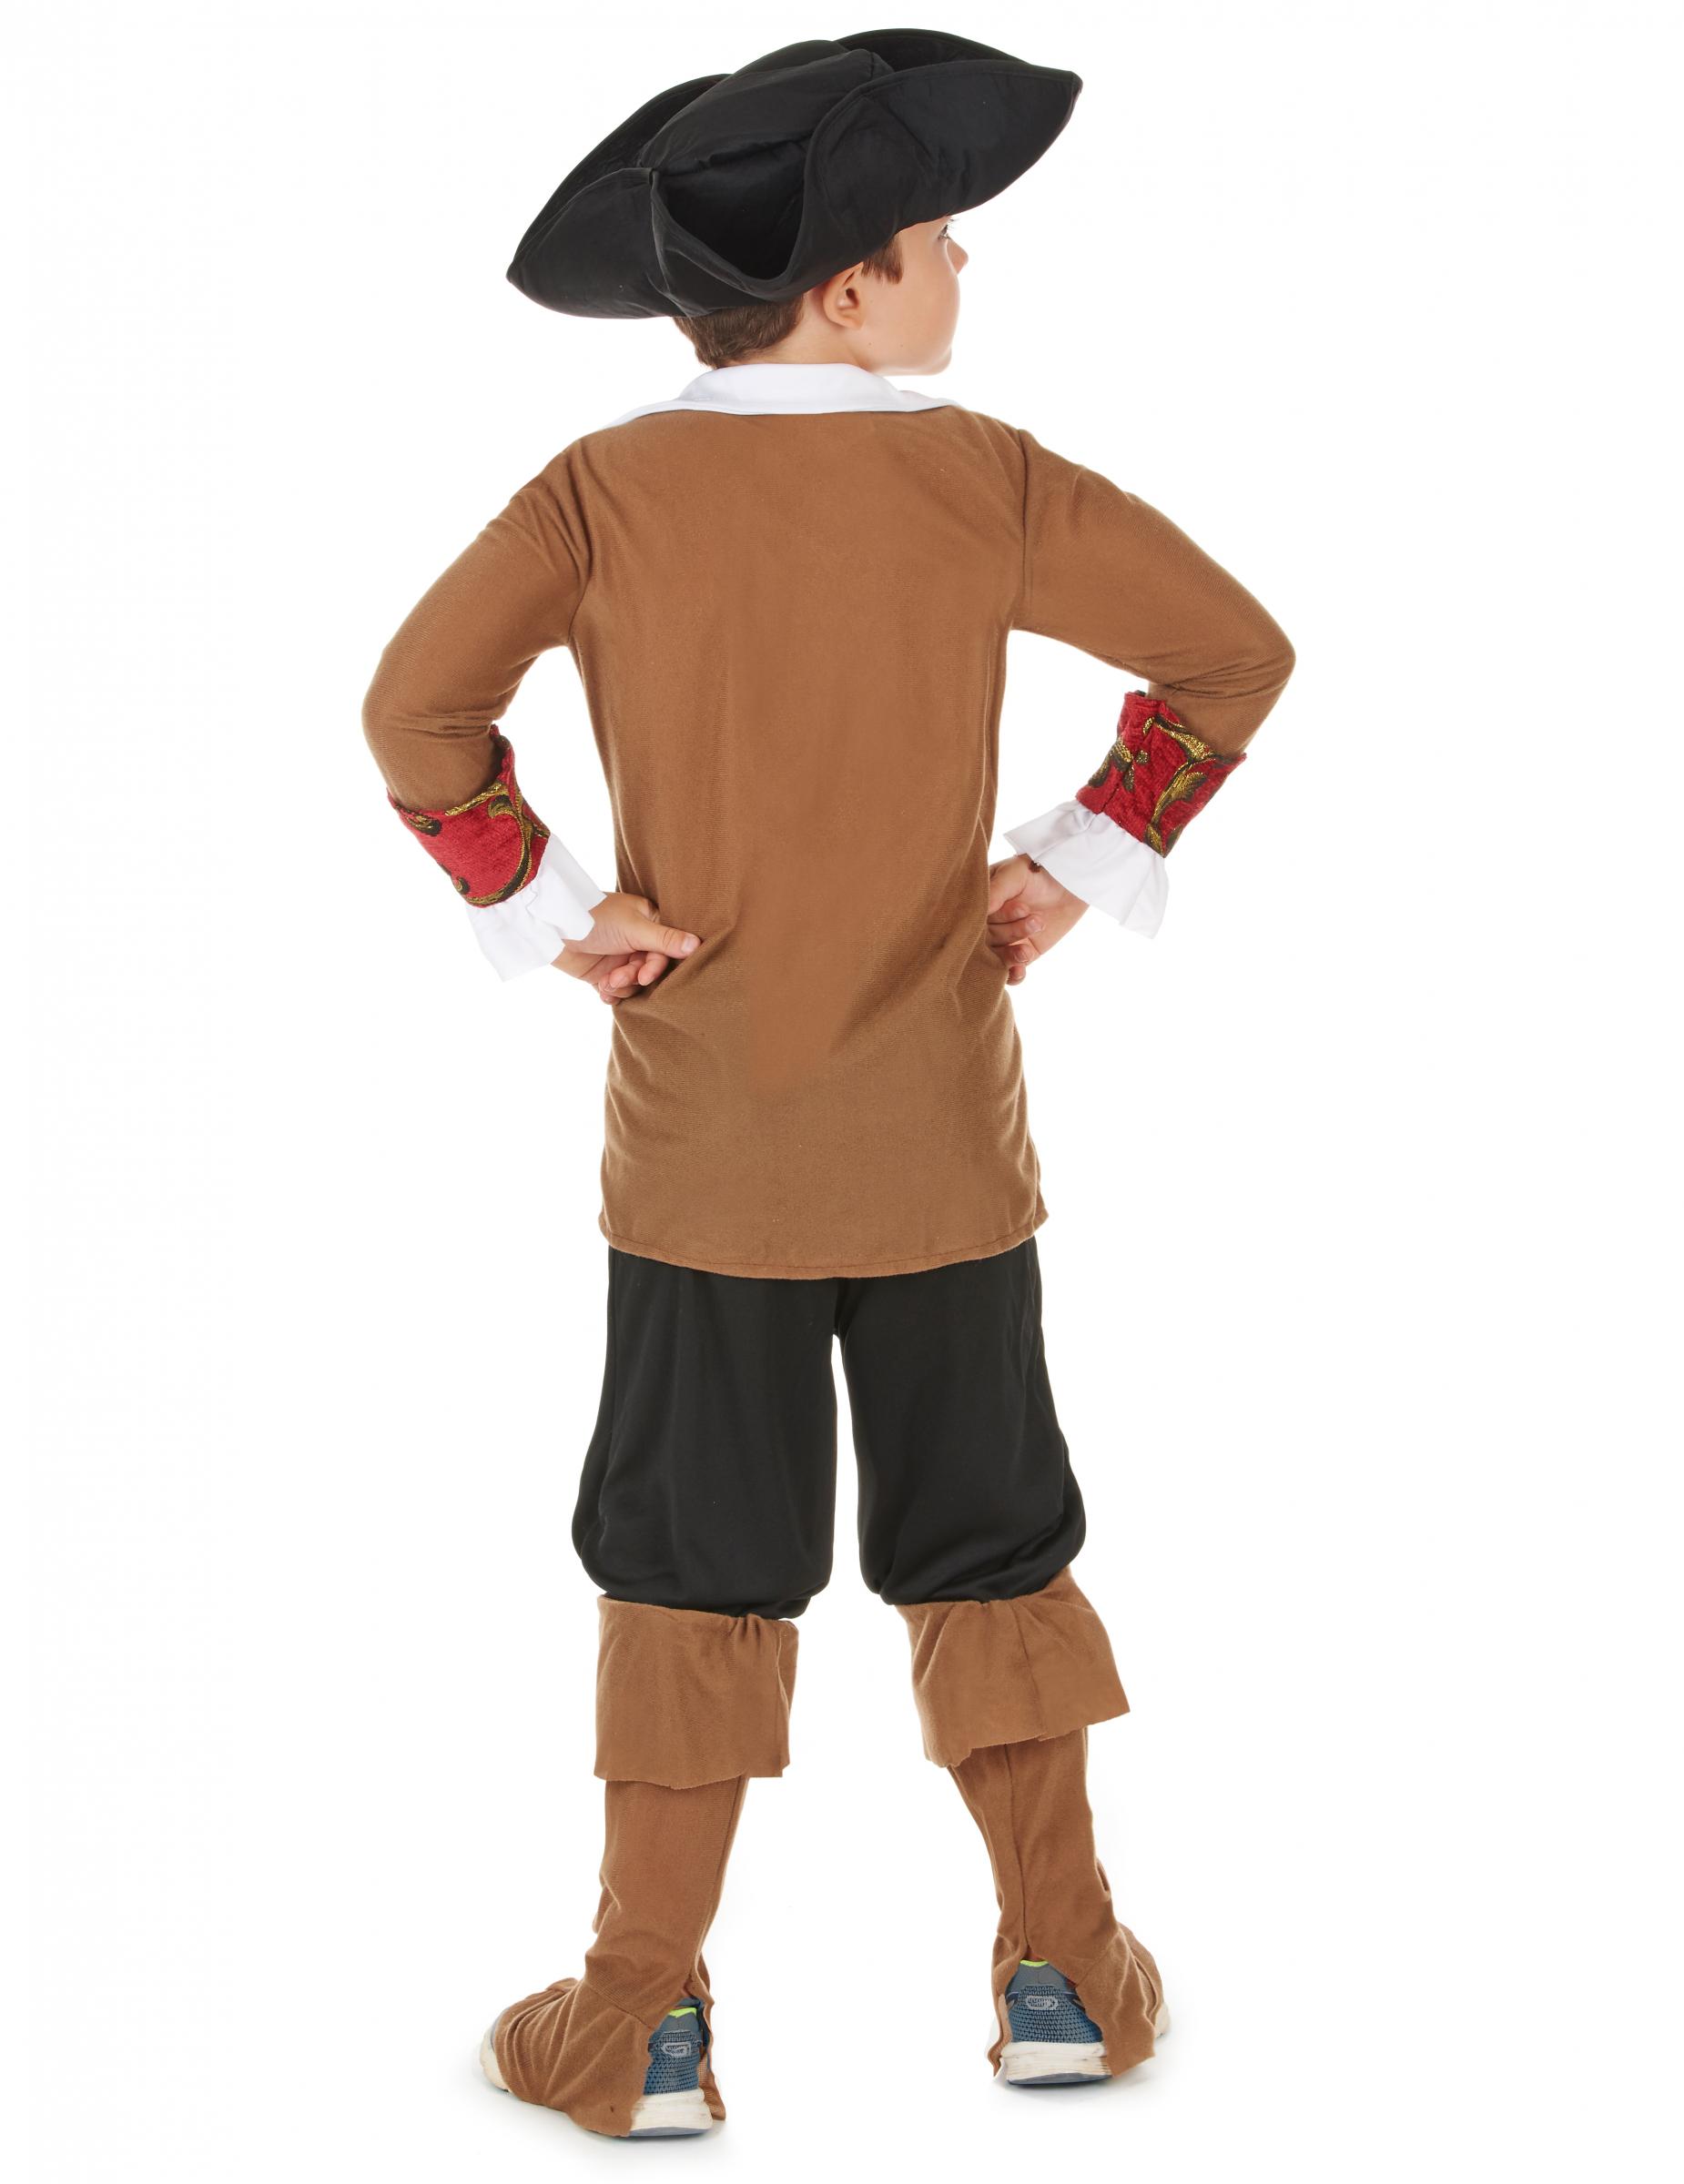 verkleidung piraten junge kost me f r kinder und g nstige faschingskost me vegaoo. Black Bedroom Furniture Sets. Home Design Ideas